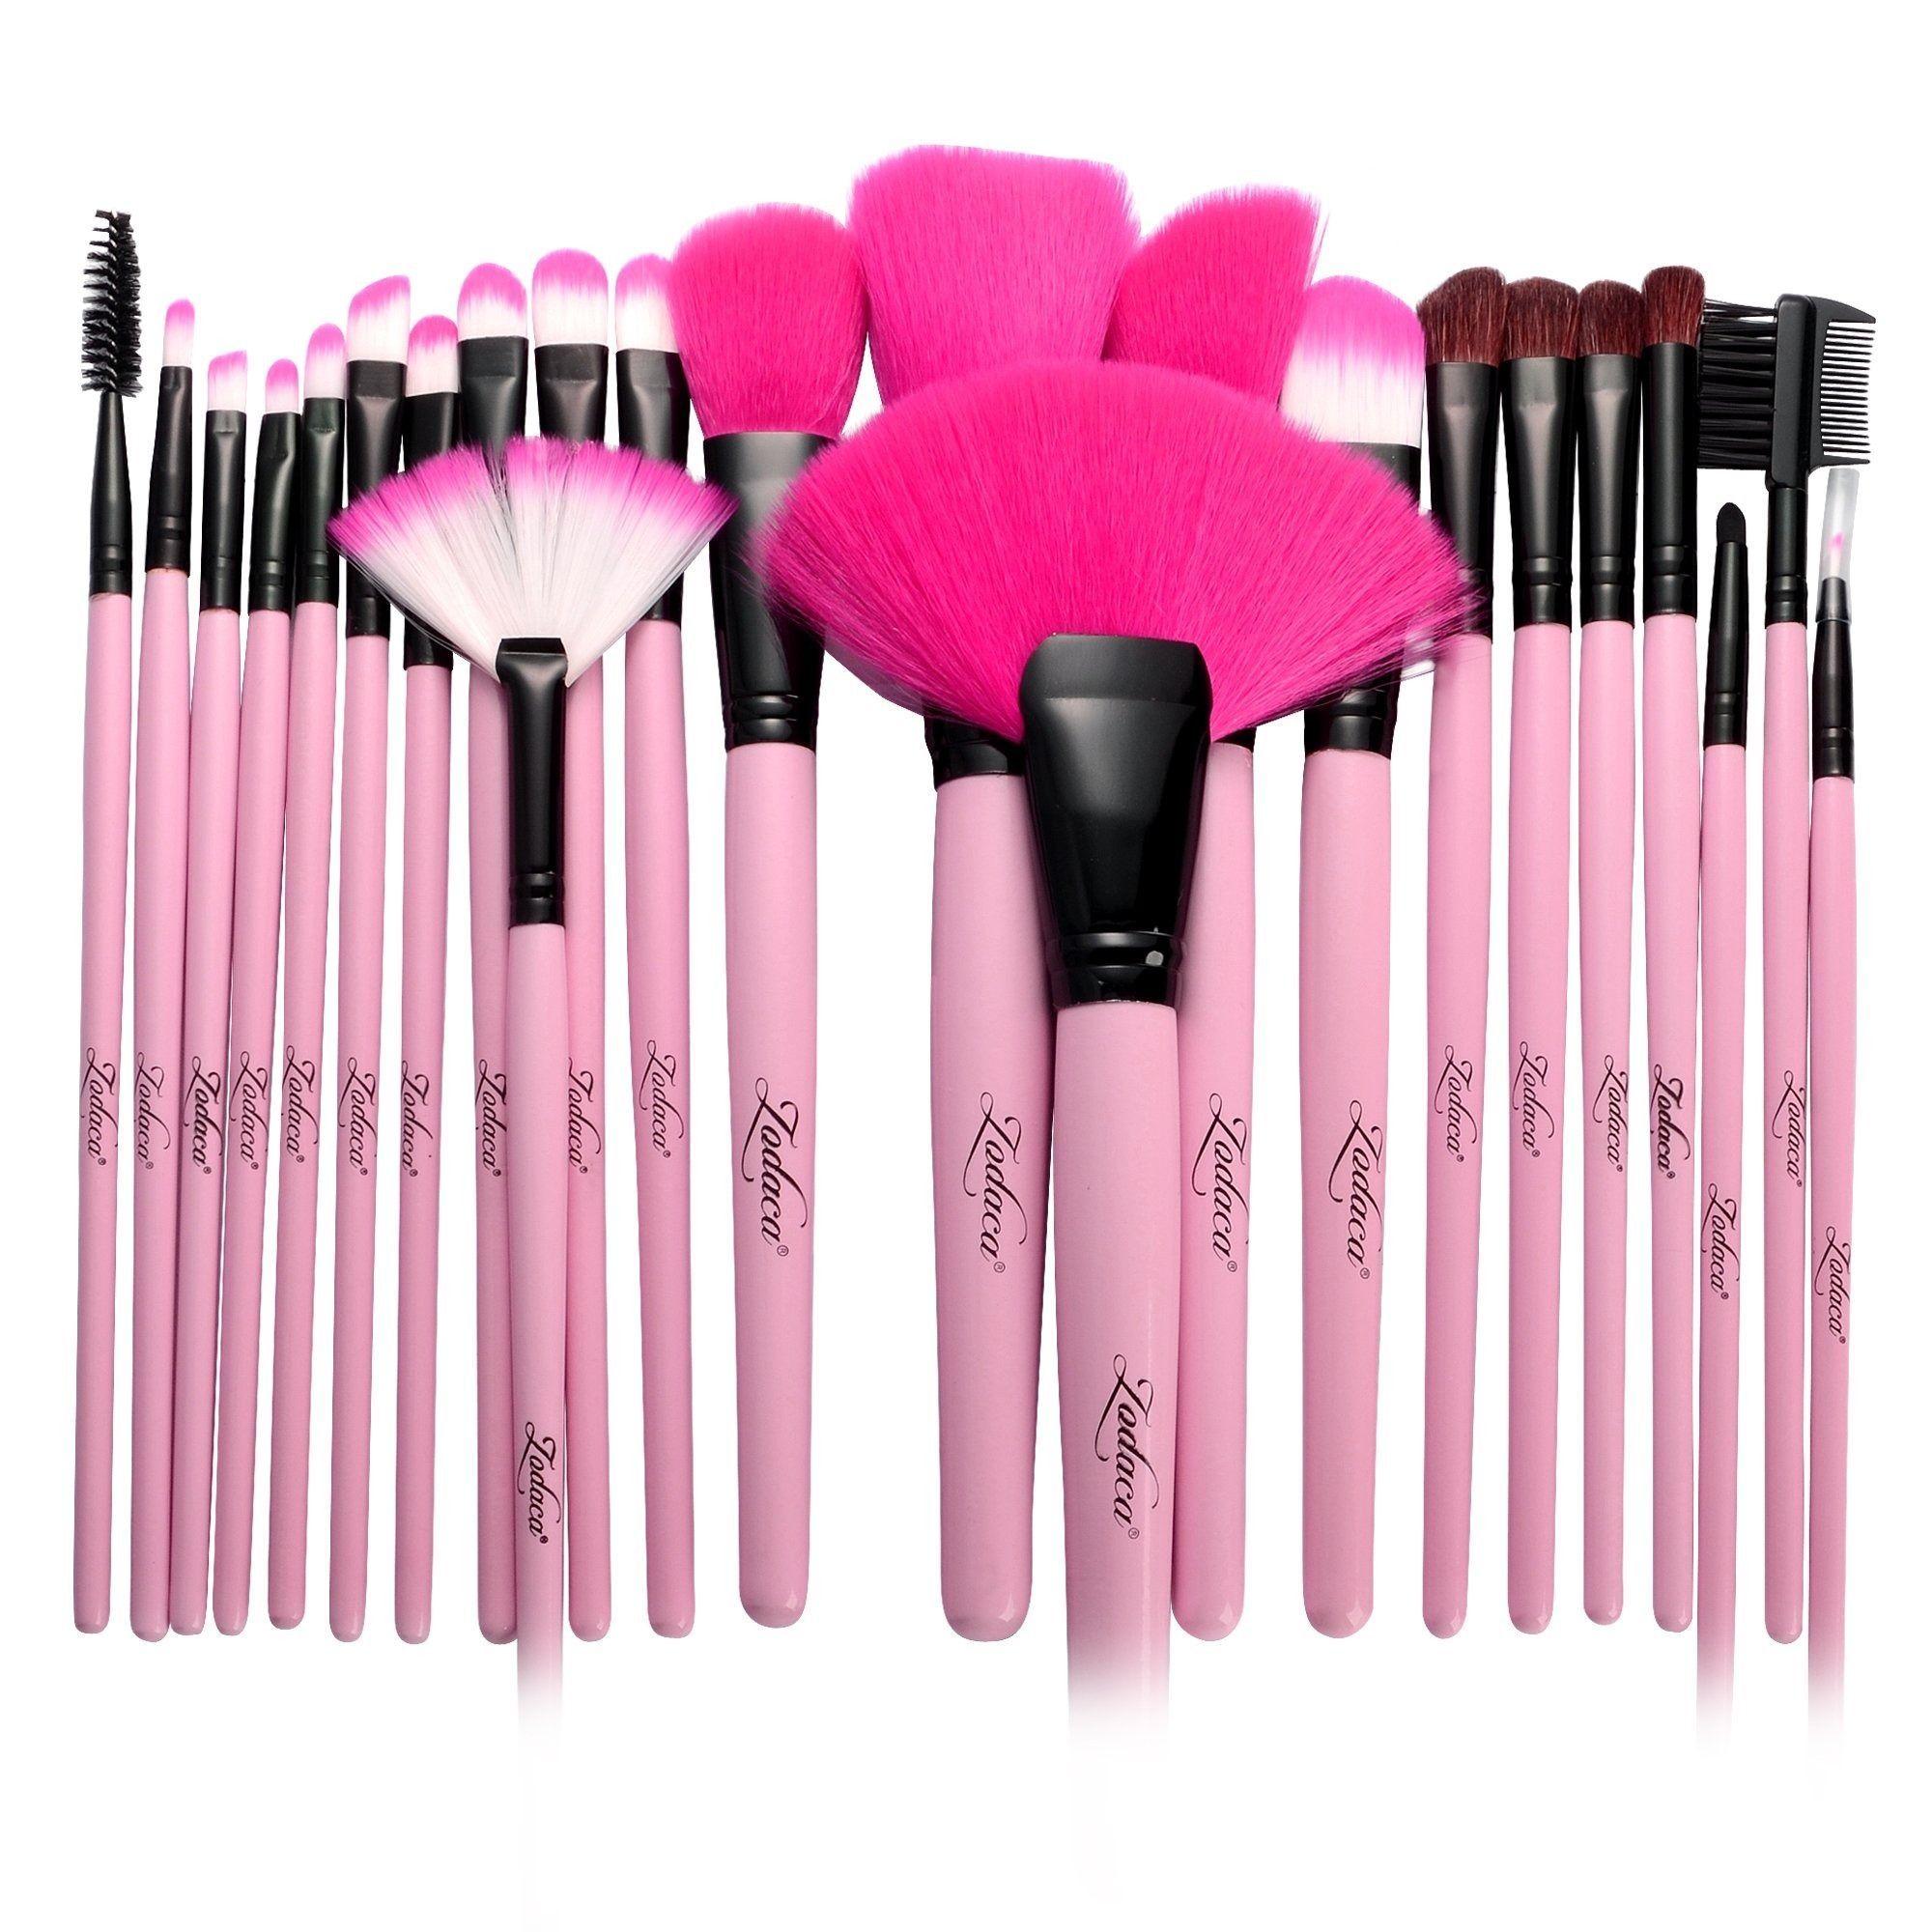 Overstock Com Online Shopping Bedding Furniture Electronics Jewelry Clothing More Pink Makeup Brush Makeup Brush Set Professional Makeup Brush Set